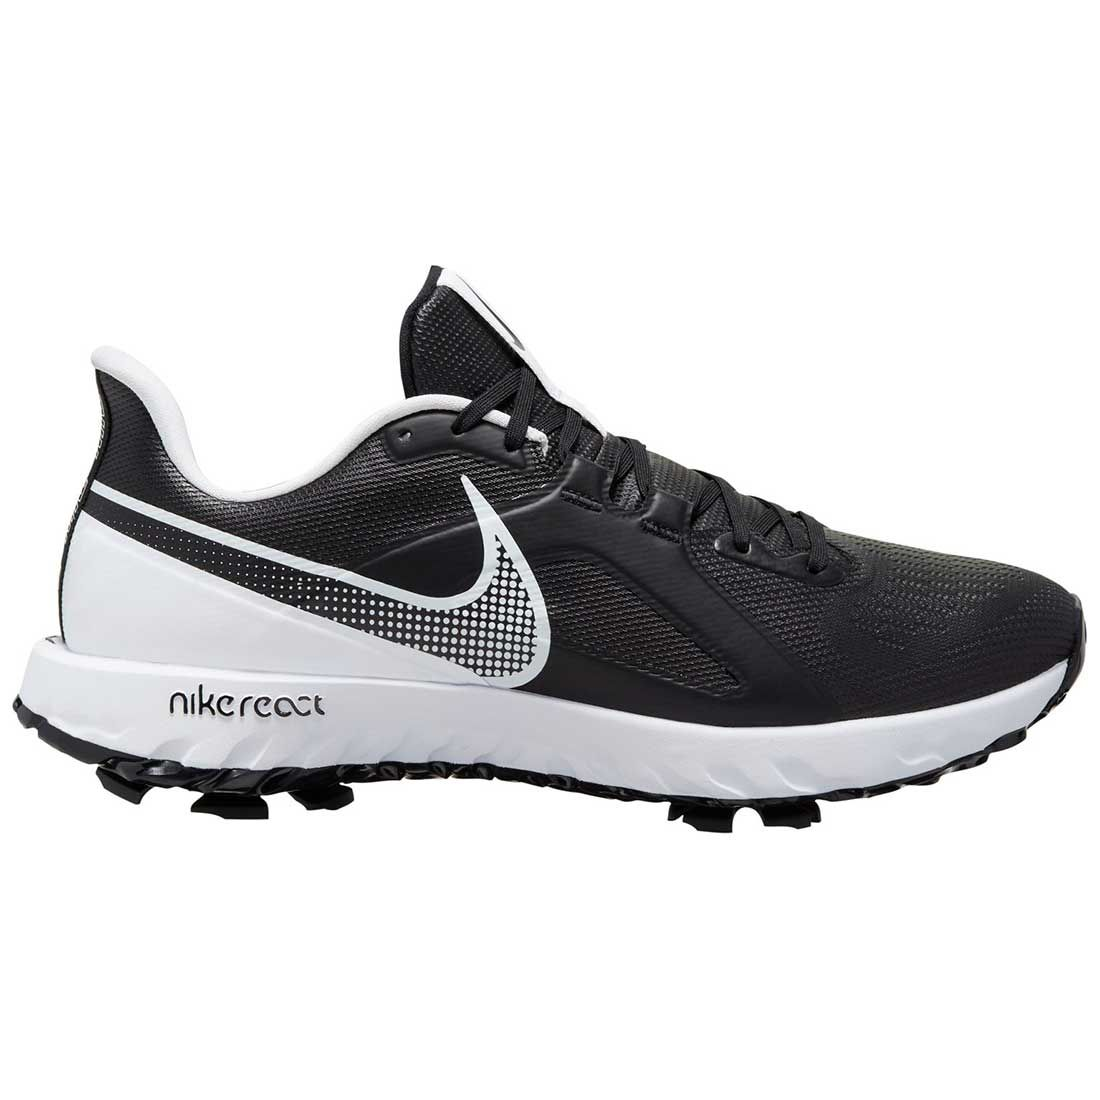 Buy Nike React Infinity Pro Golf Shoes